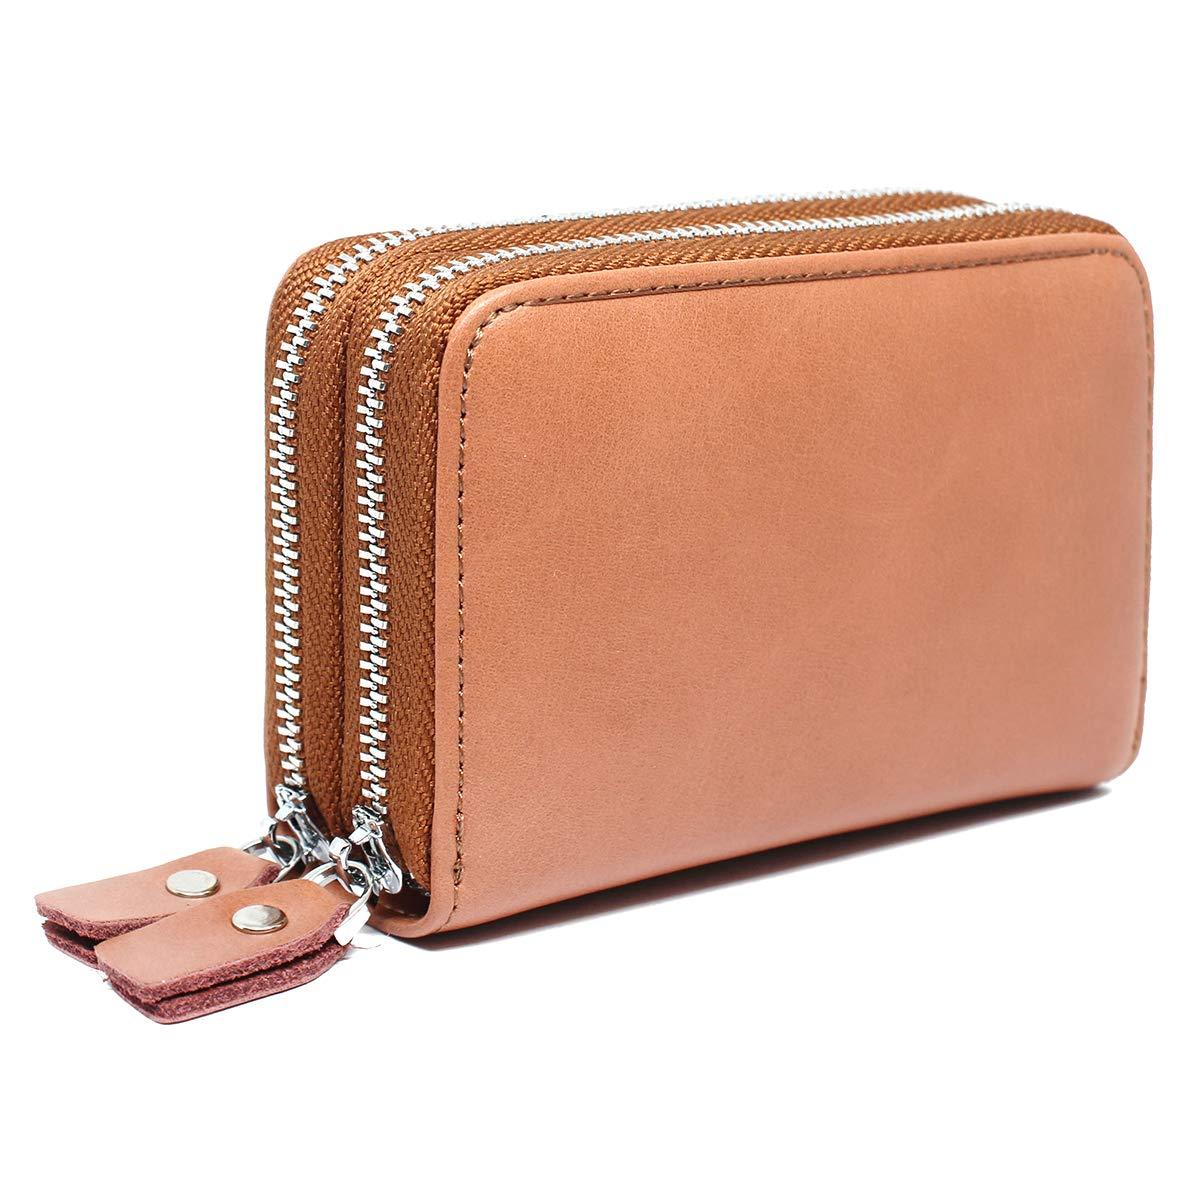 imeetu Women/Men RFID Credit Card Holder, Leather Card Wallet Case Purse